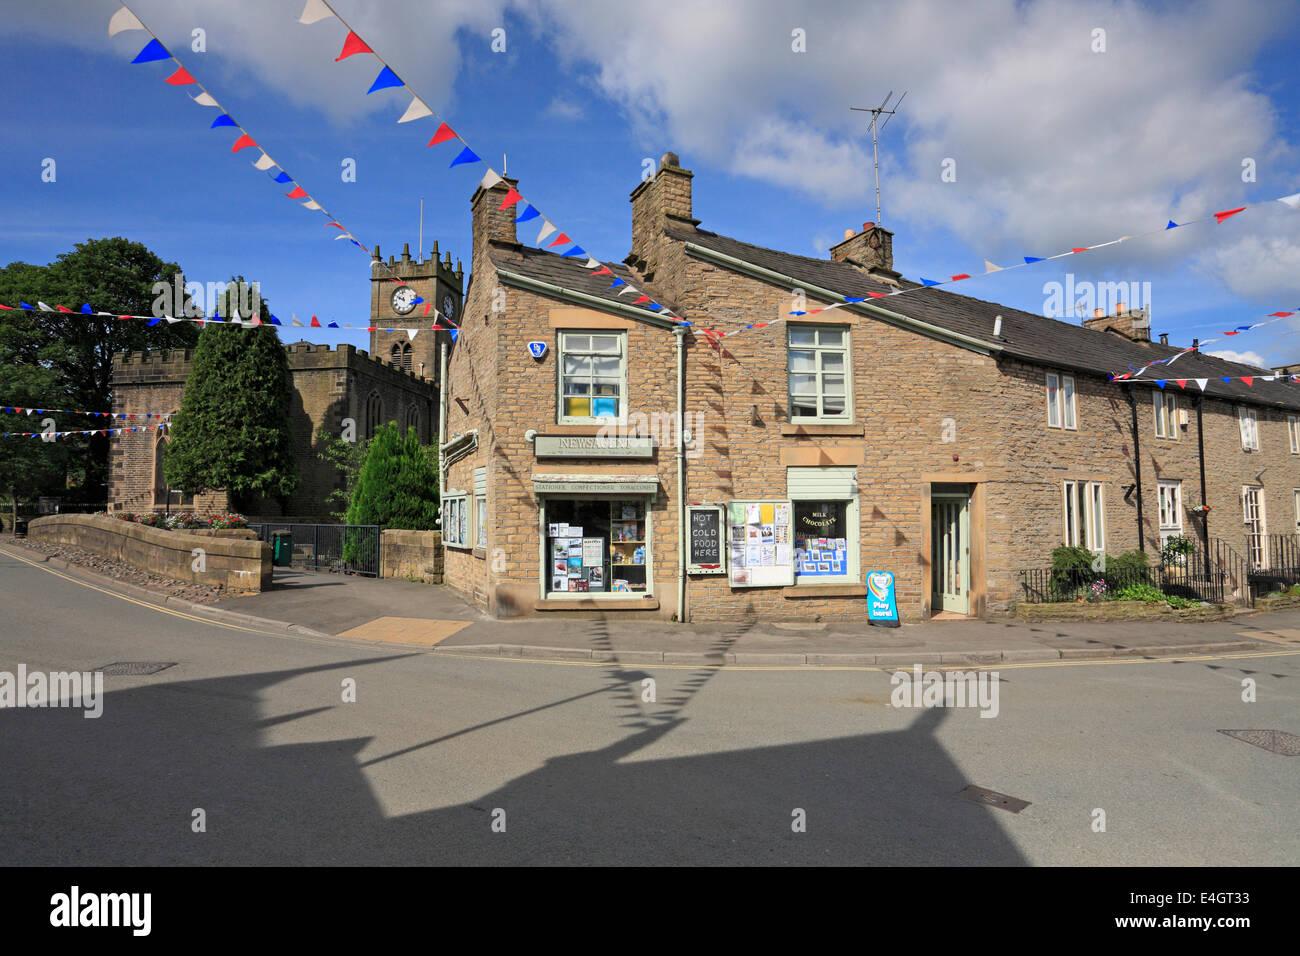 Village store and St Matthew's Church in Hayfield, Derbyshire, England, UK. - Stock Image